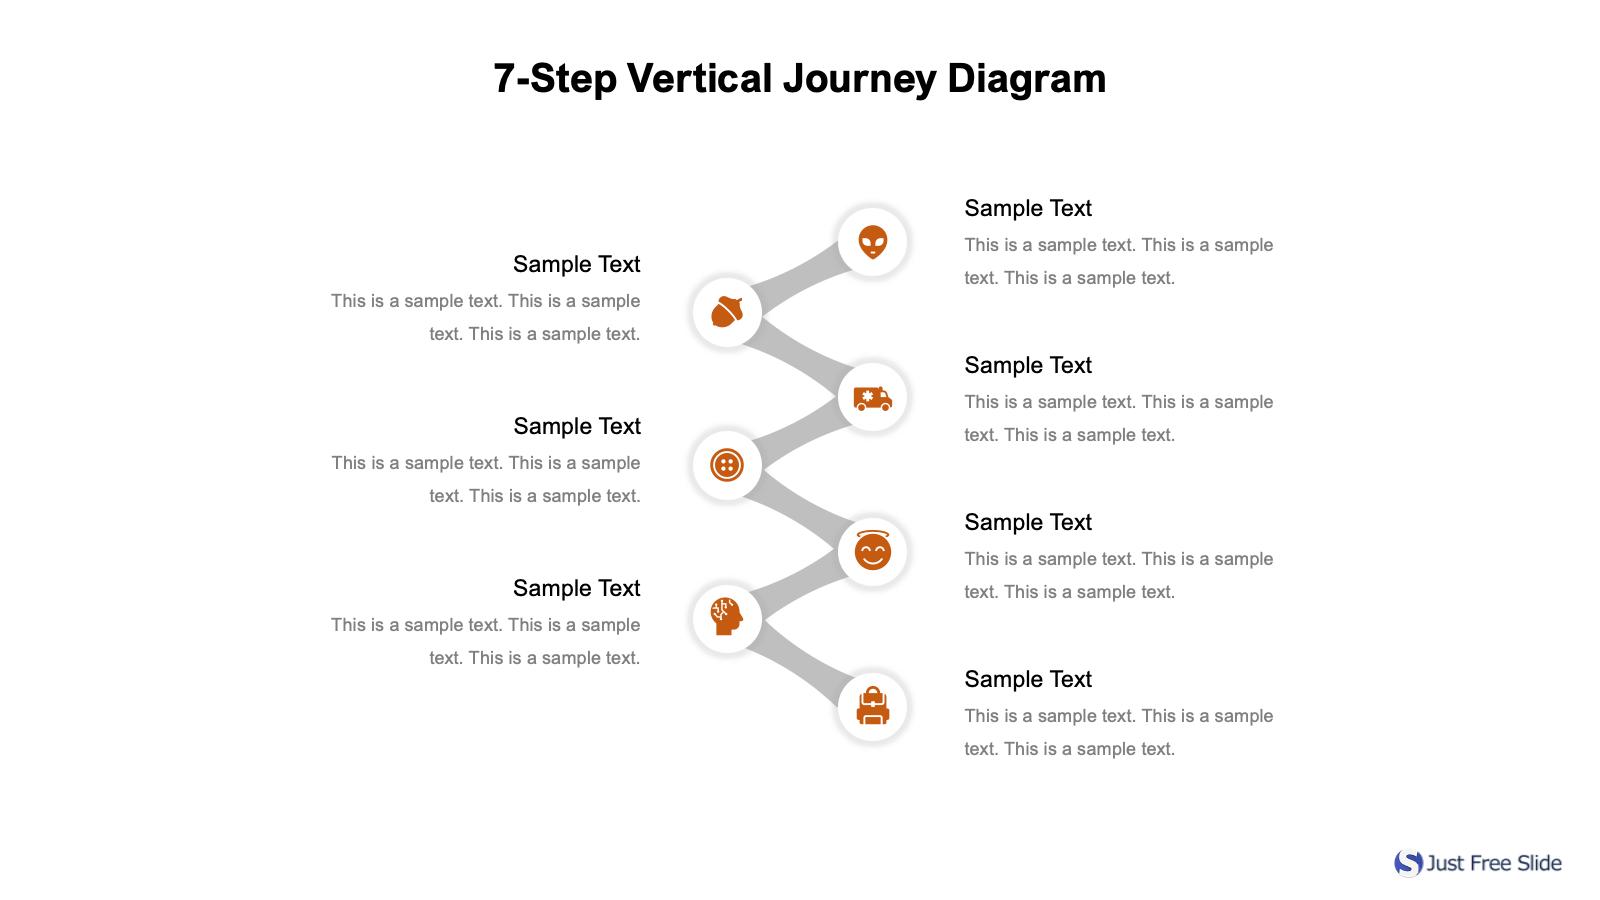 7-Step Vertical Journey Diagram Free Download